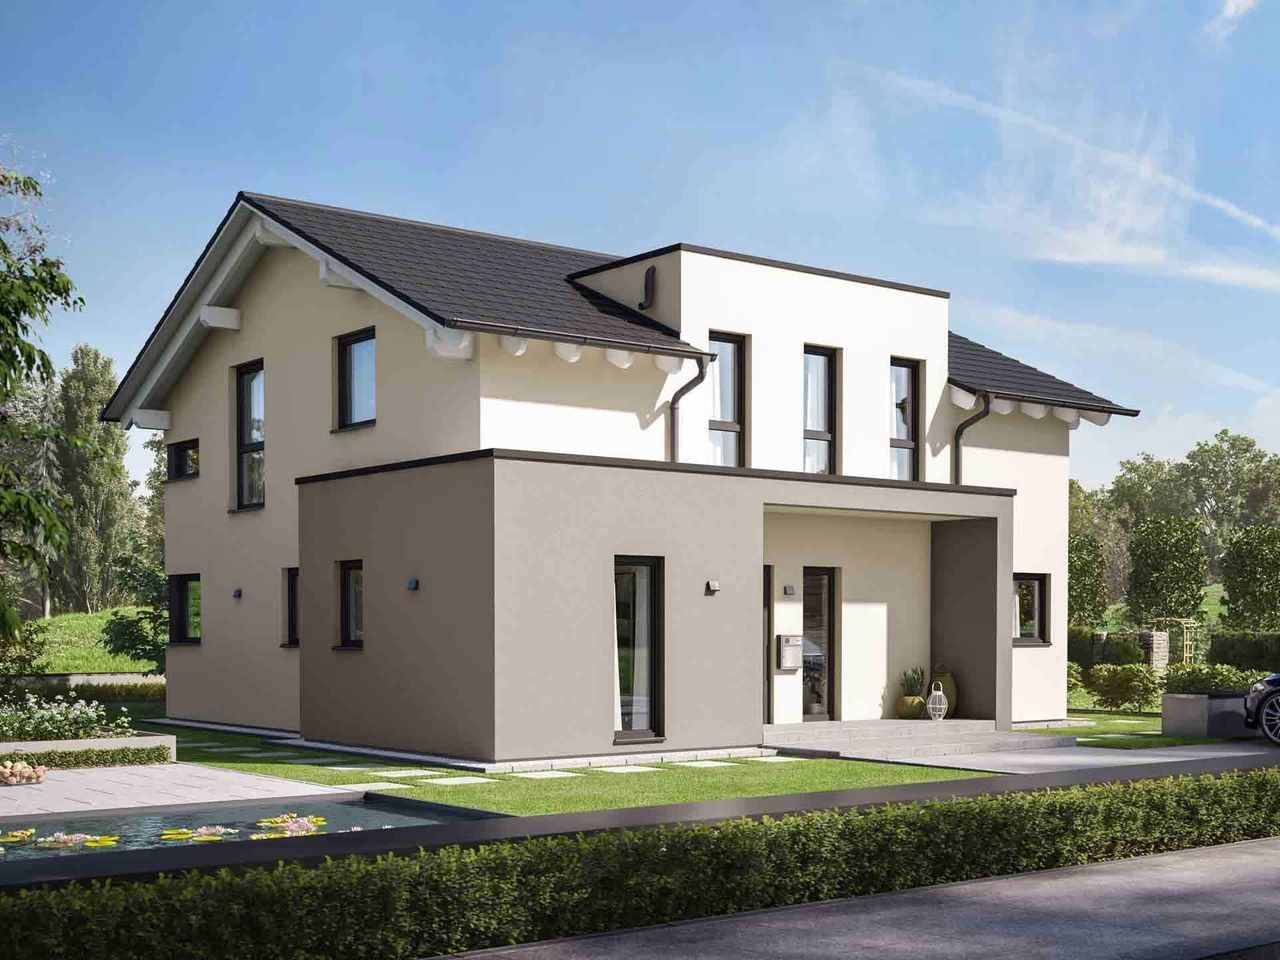 Einfamilienhaus Solitaire-E-165 E6 - Schwabenhaus